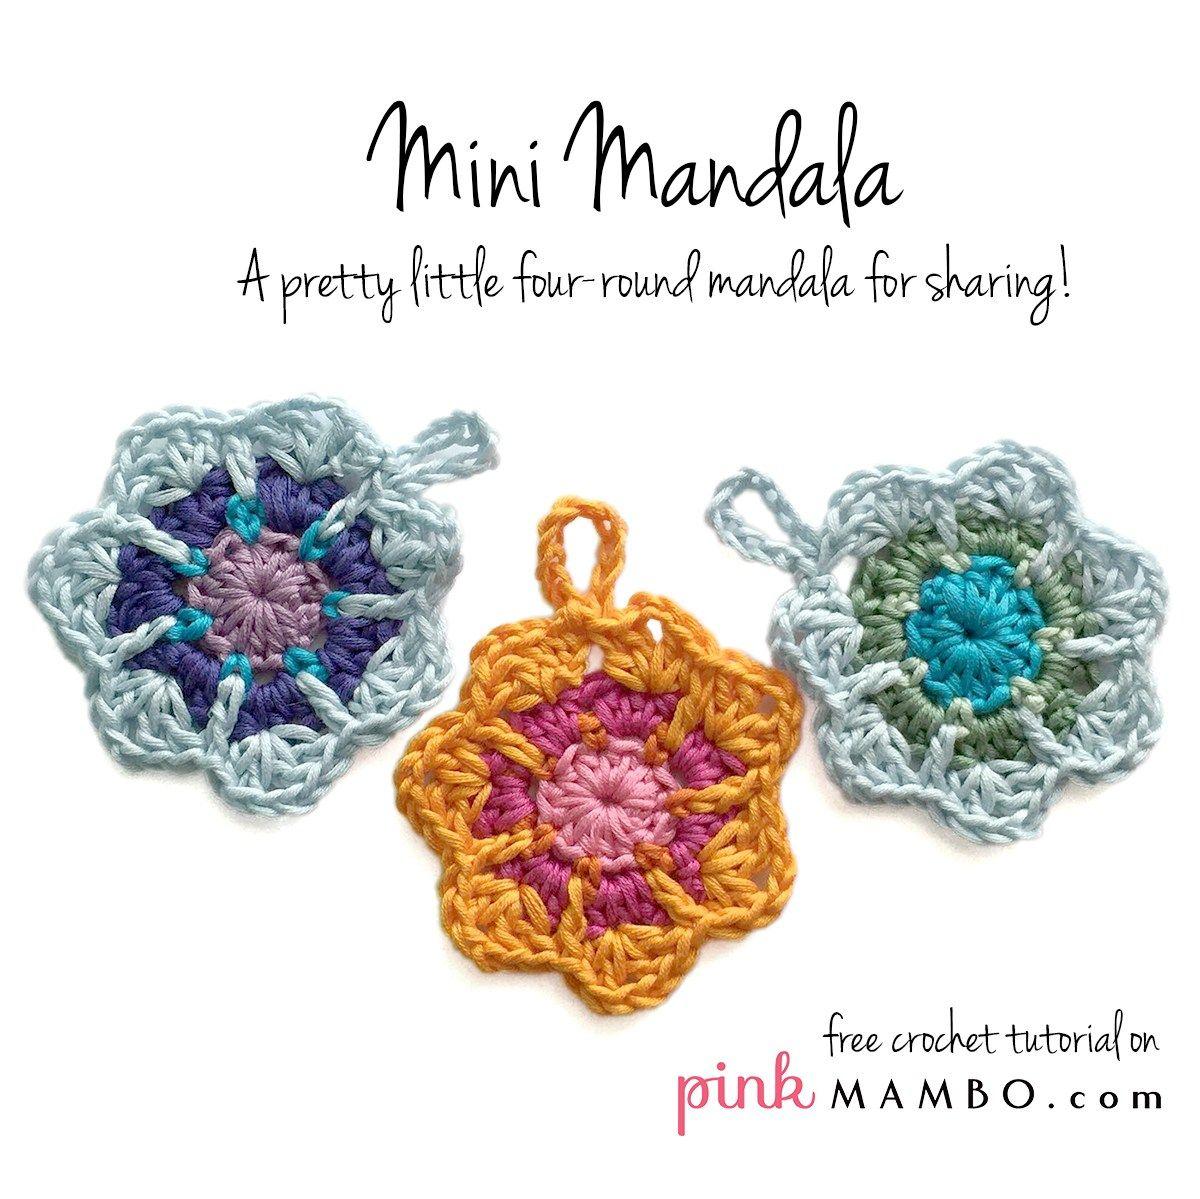 Crochet Mini Mandala Free Pattern (Mandalas for Marinke) | WHAT I ...